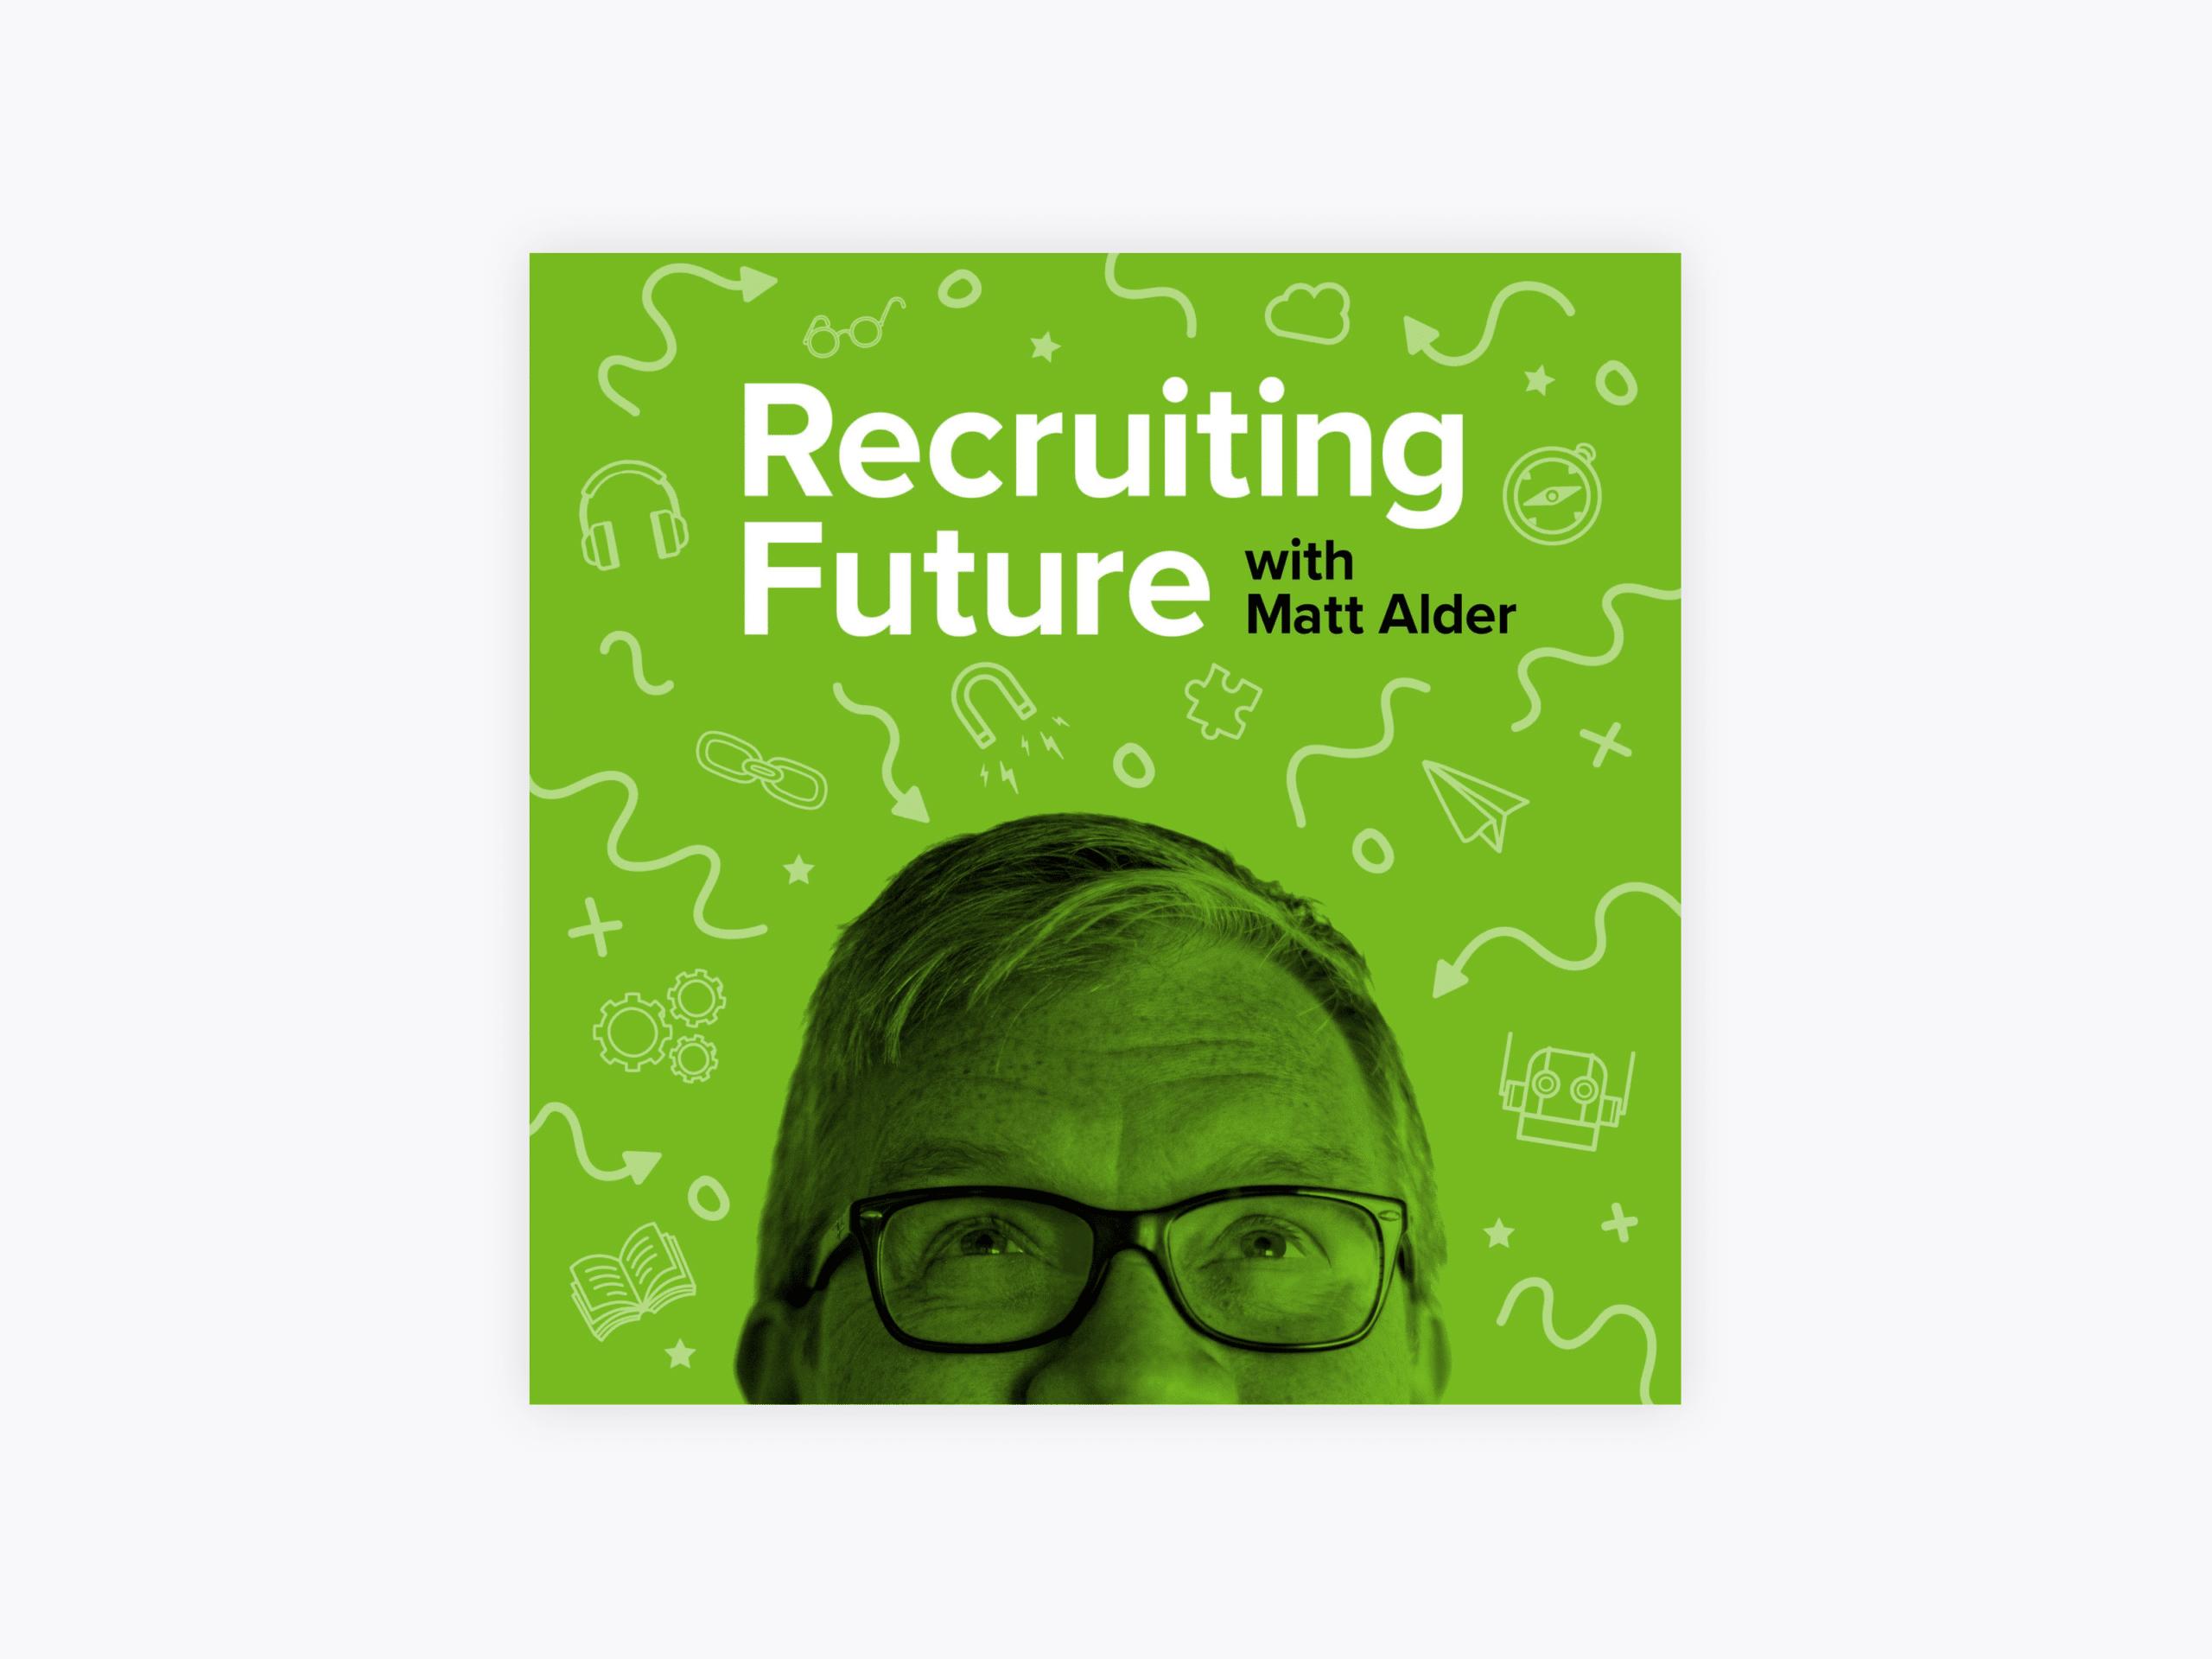 Cover art for recruiting future with matt alder